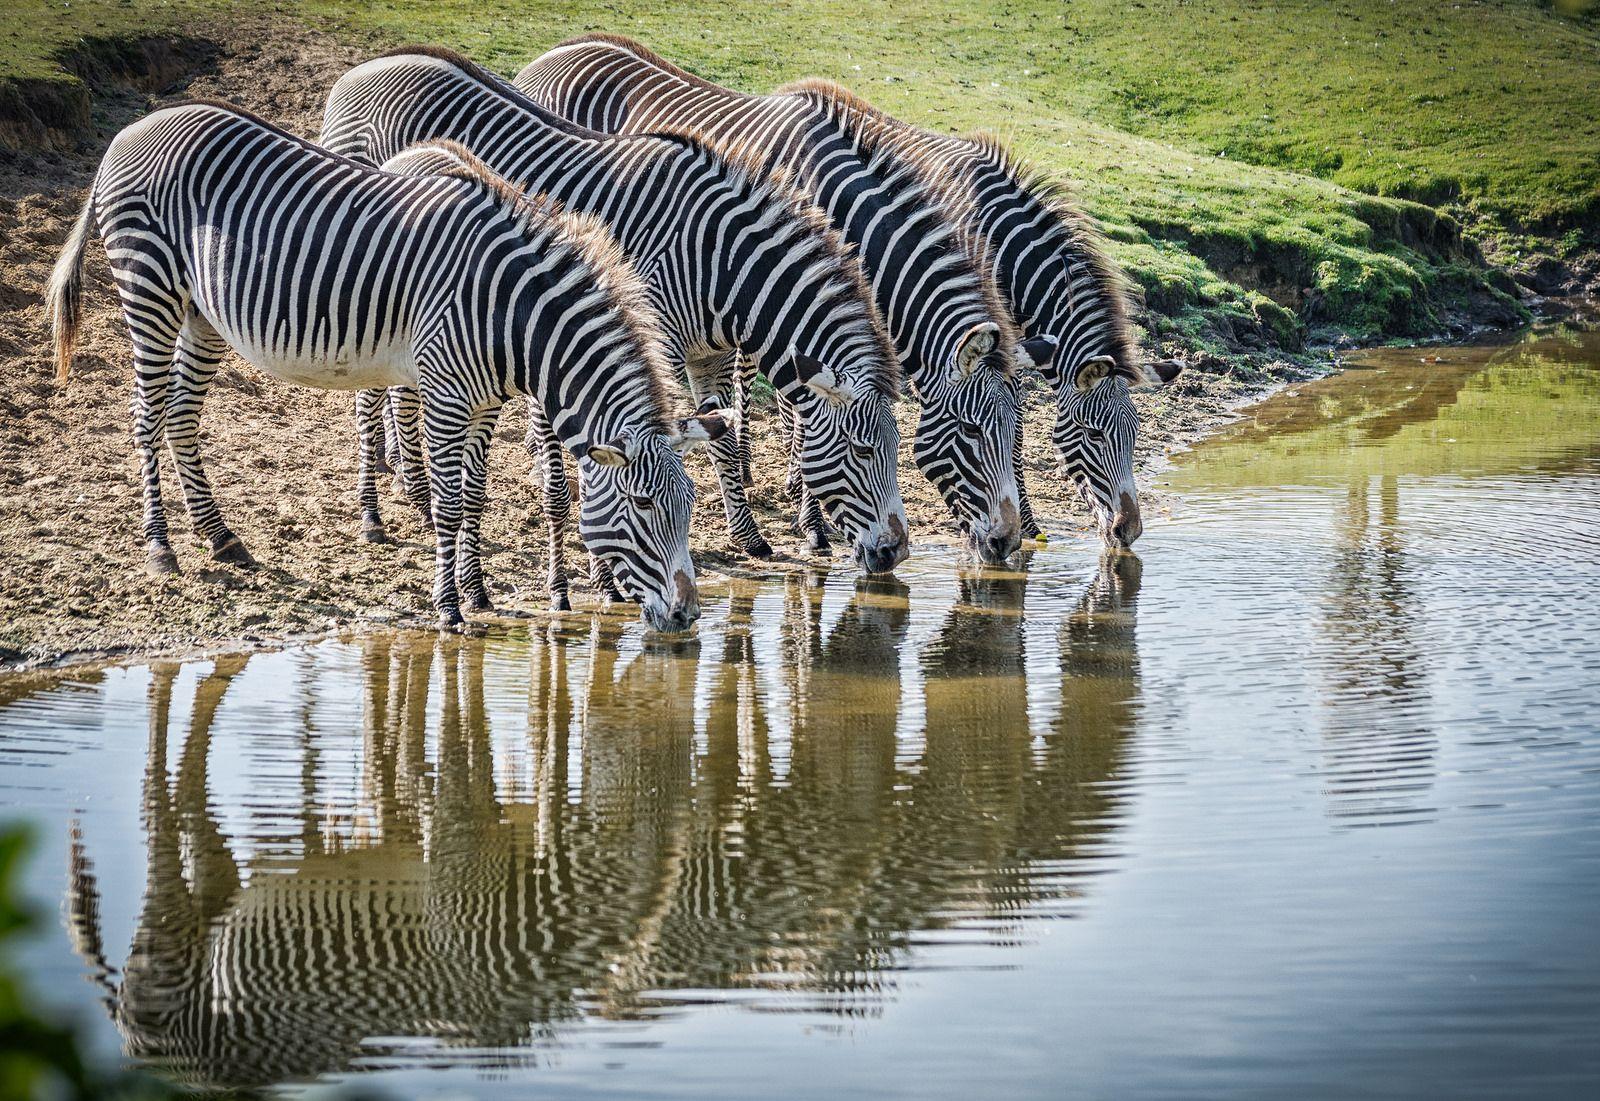 https://flic.kr/p/ARiSJZ | Grevyzebras / Grévy's Zebras | Grevyzebras im Safaripark Beekse Bergen.  Grévy's Zebras, Safaripark Beekse Bergen.